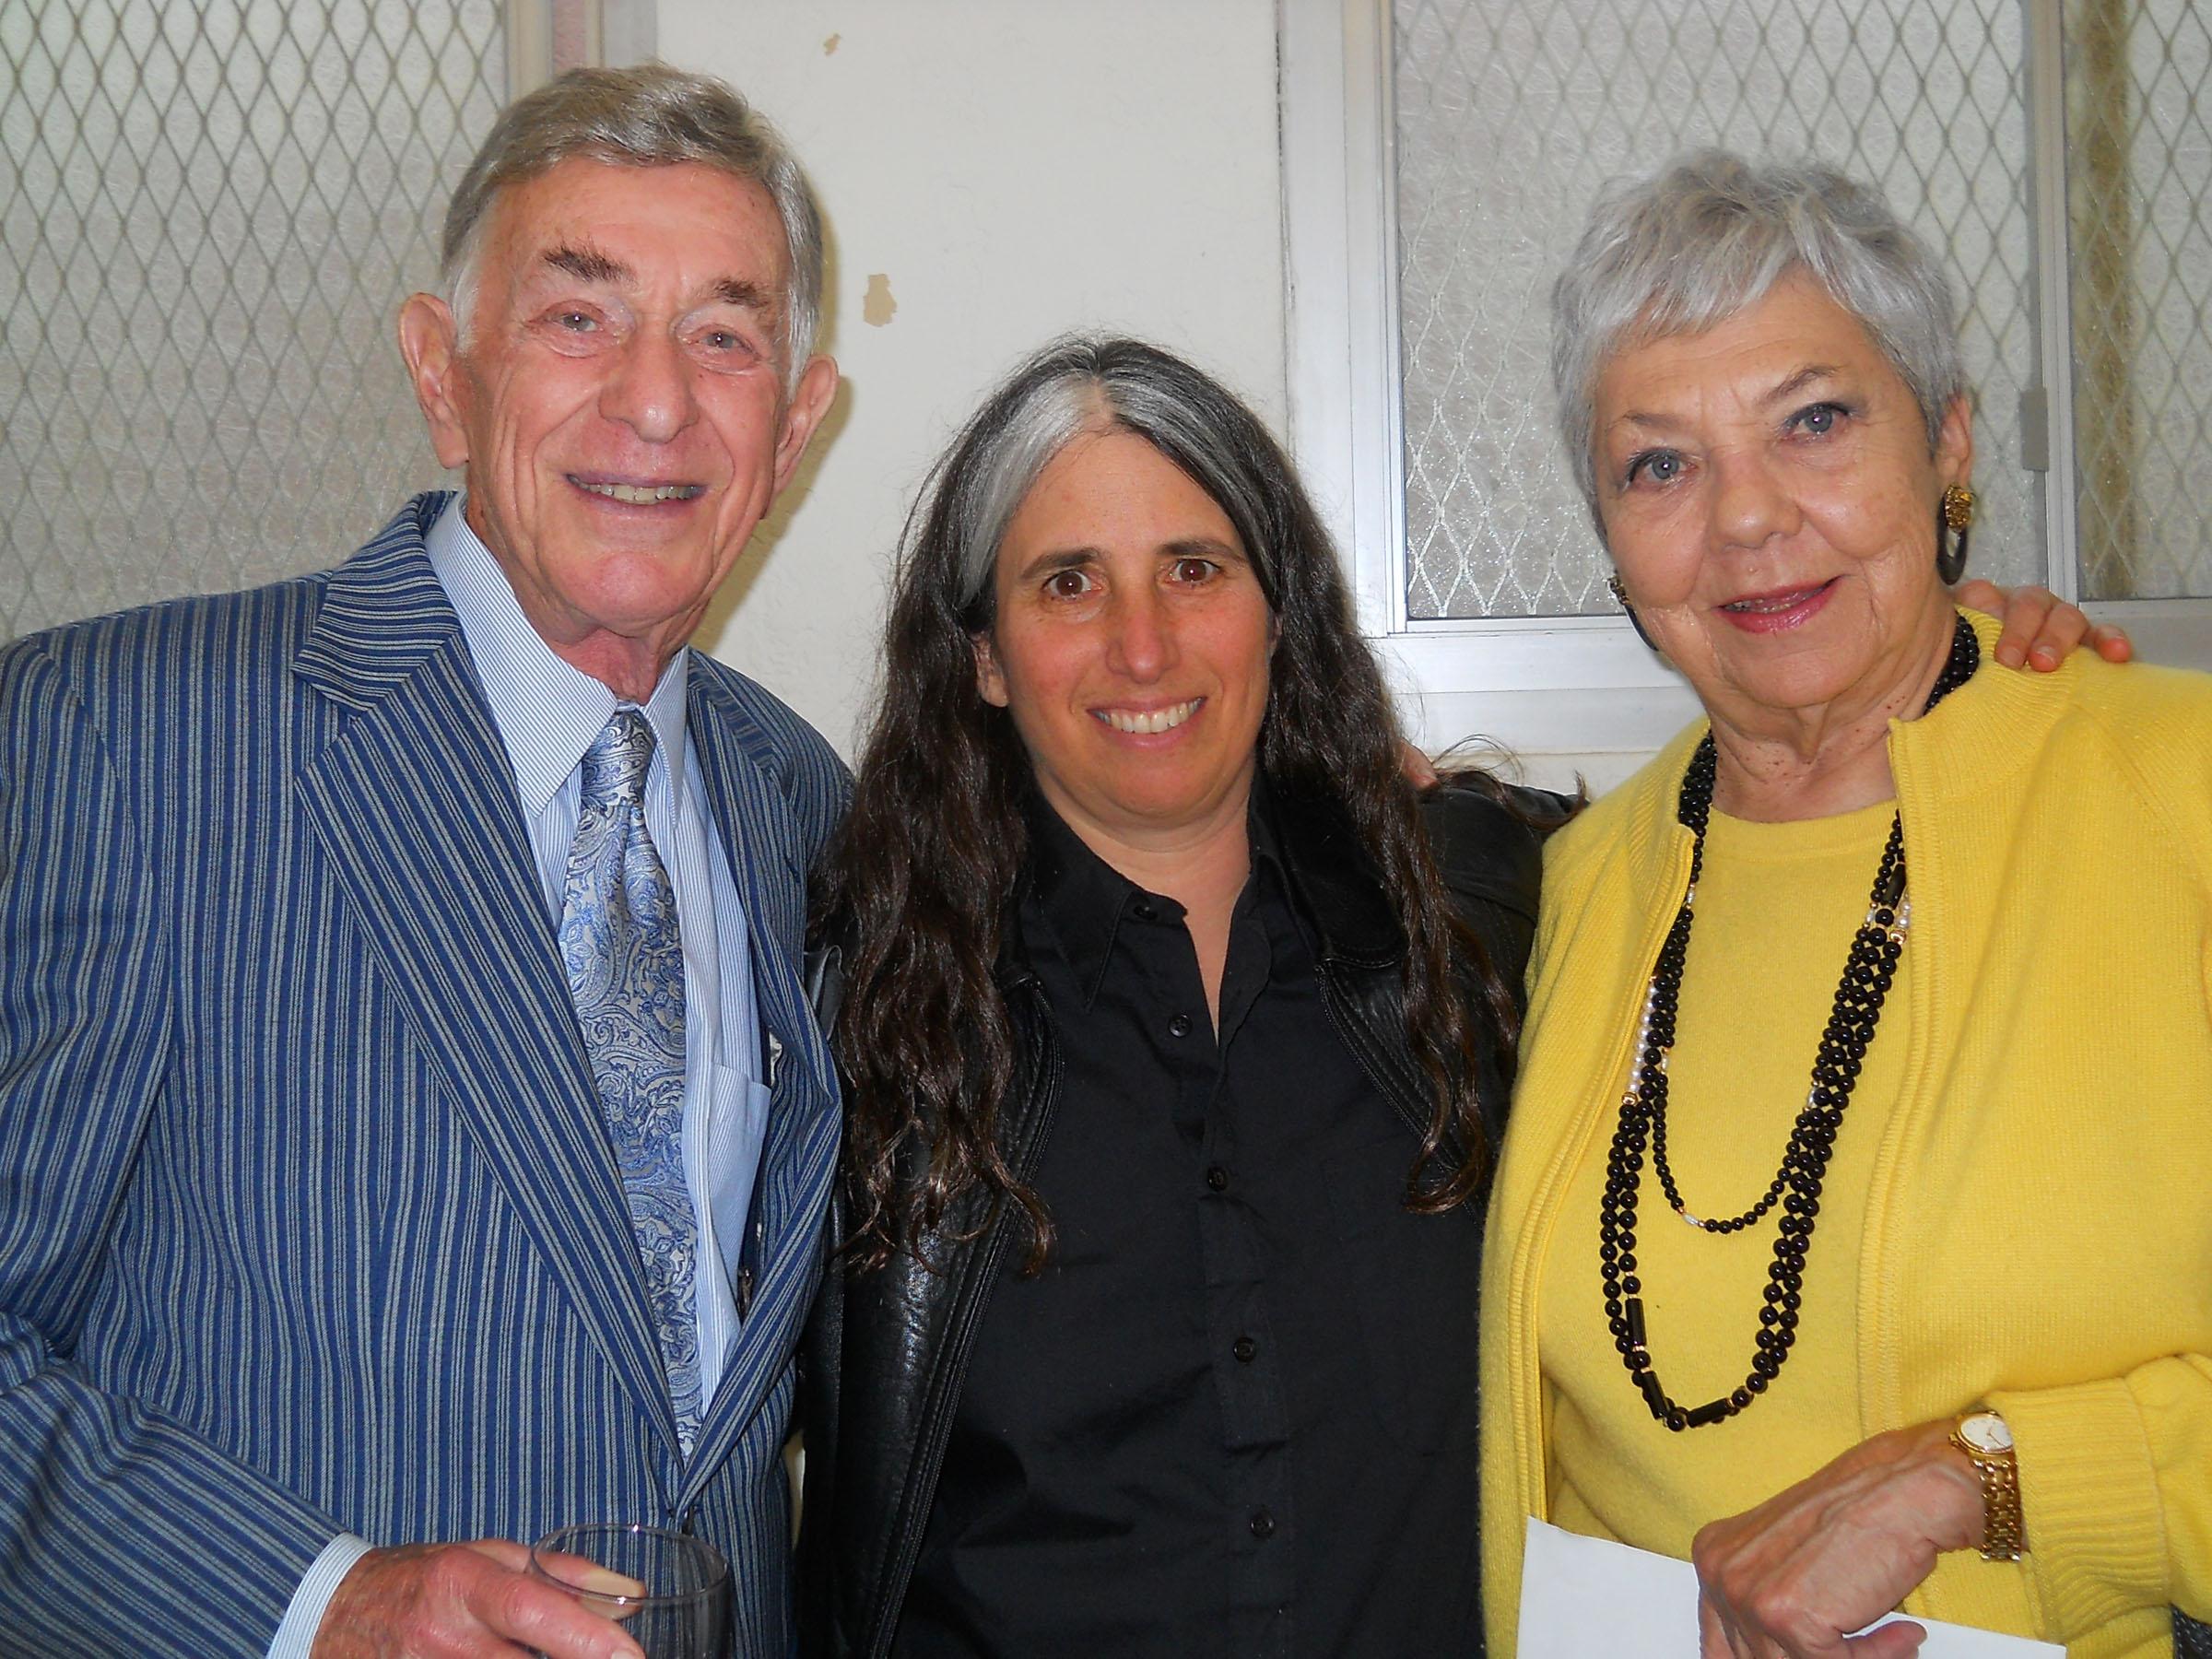 Shelley Berman, Lisa Geduldig, Sarah Berman, 2007